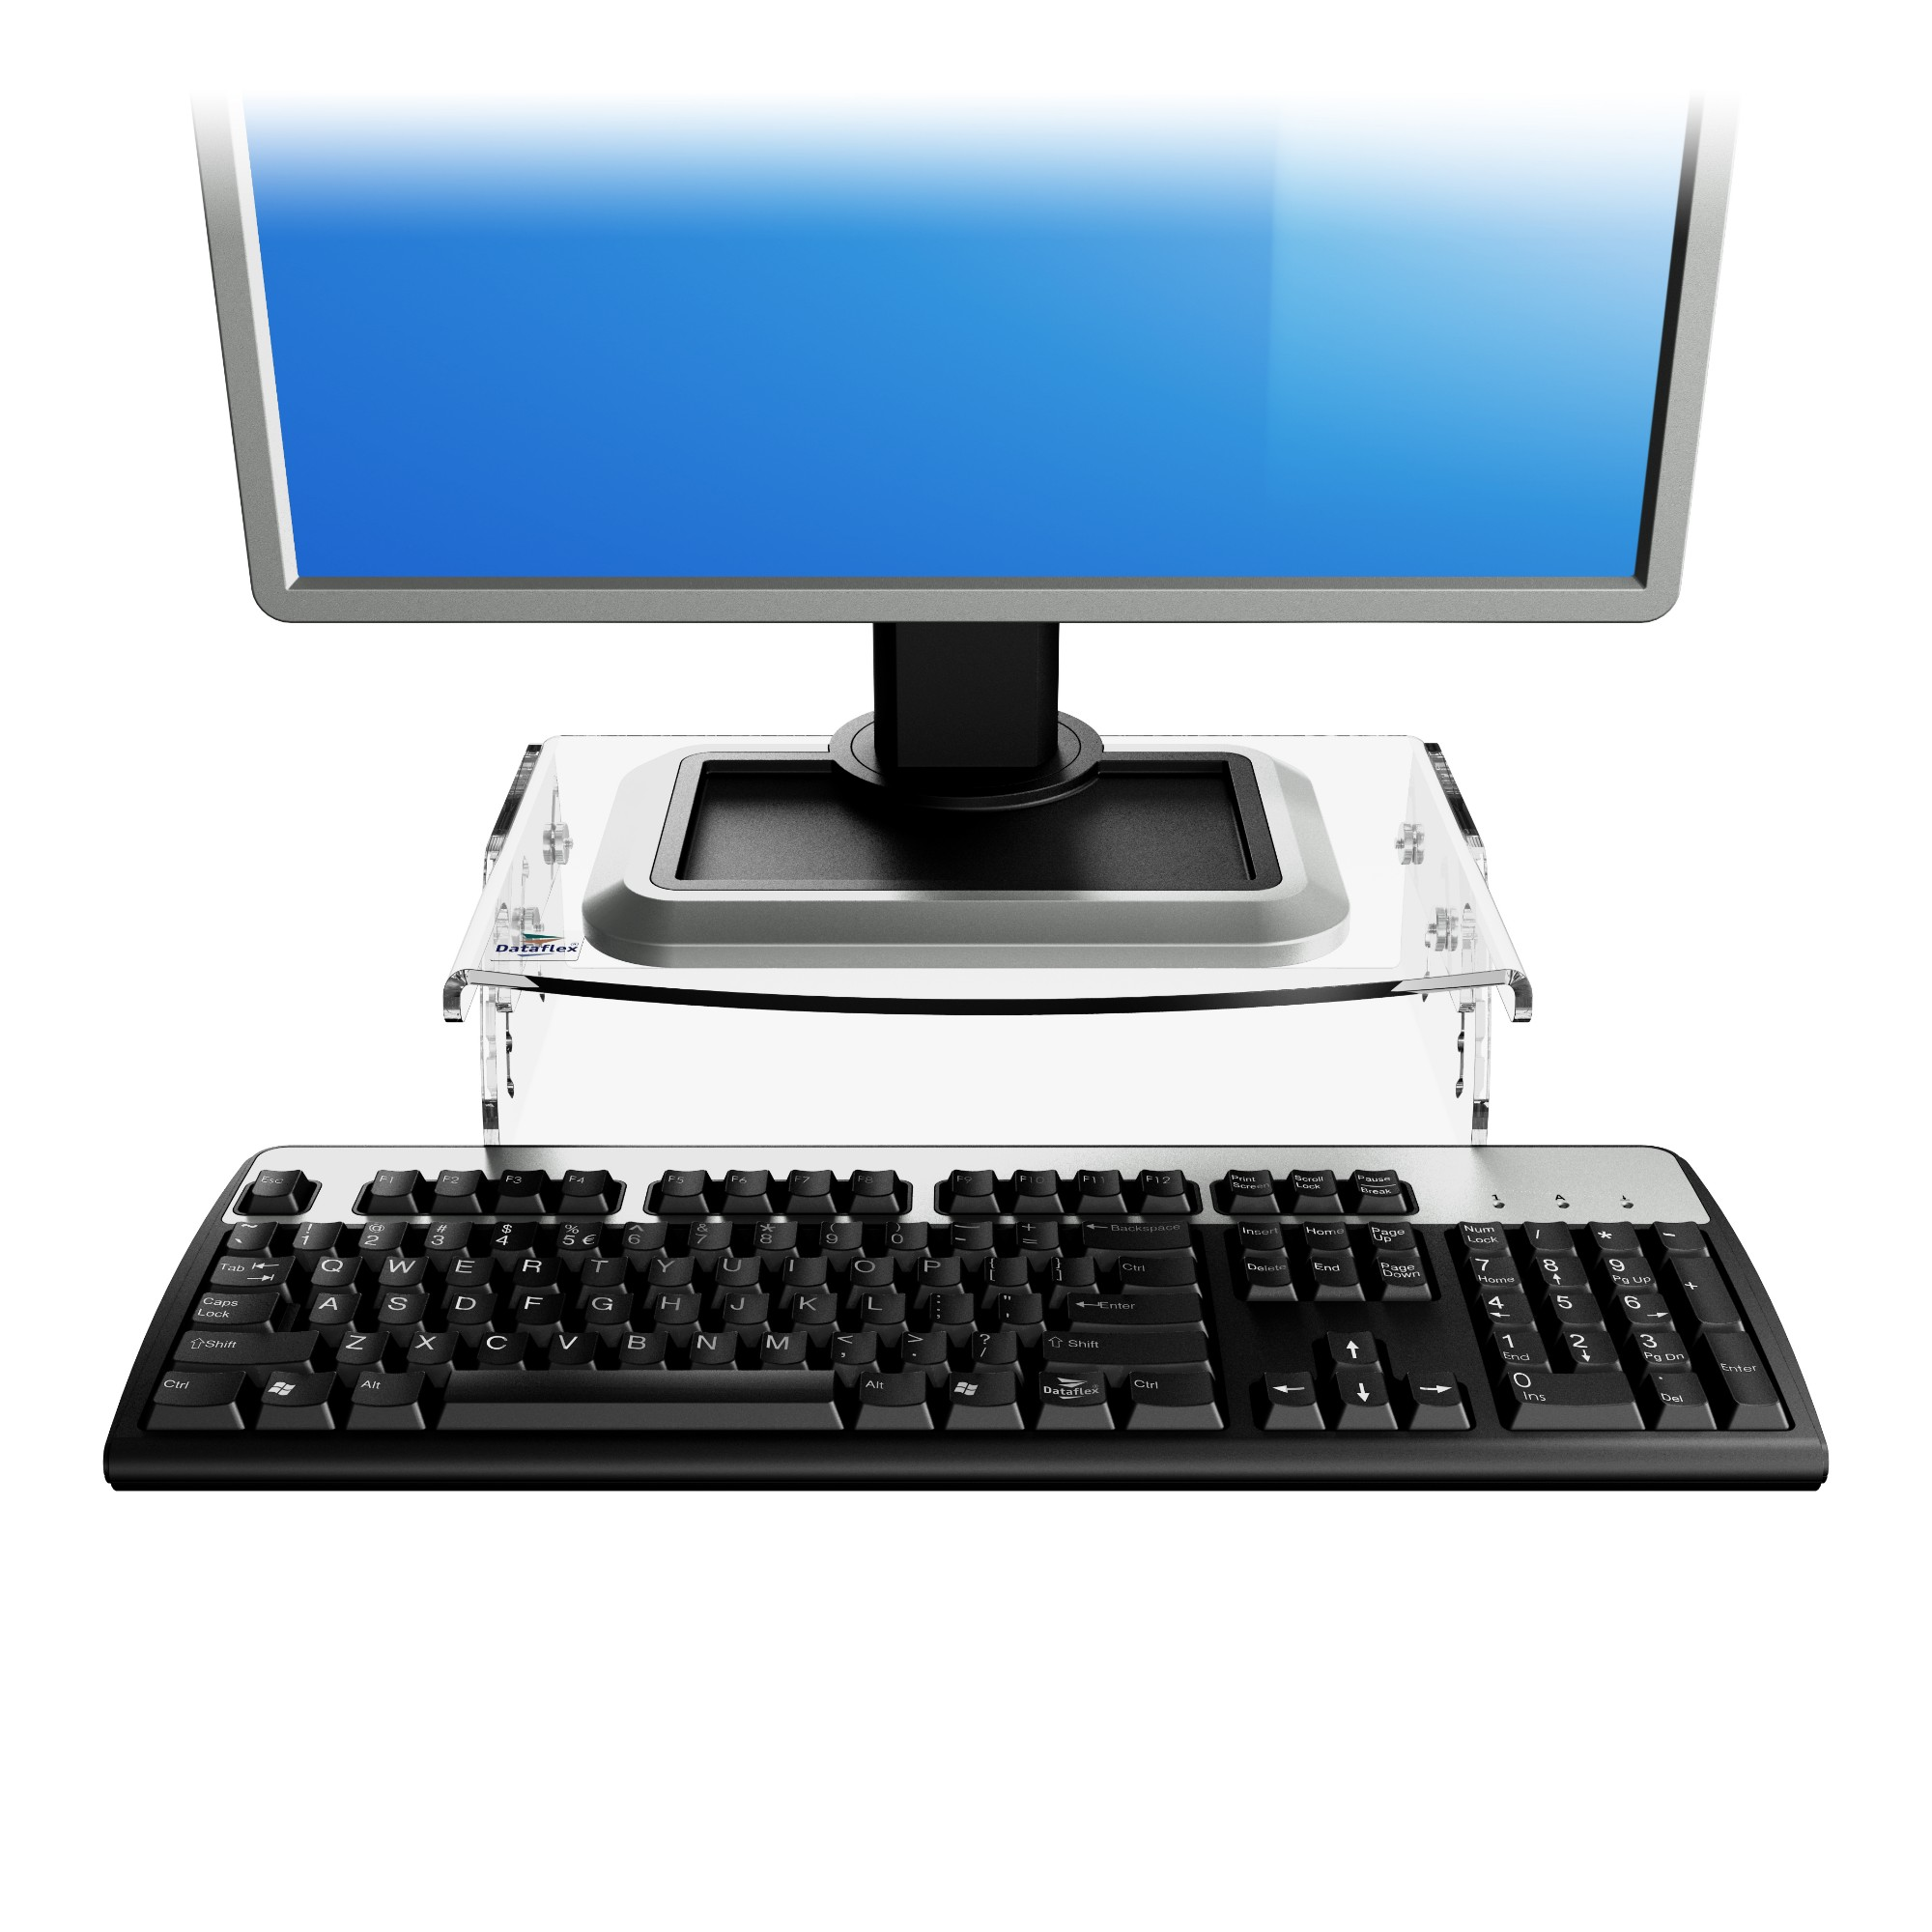 Dataflex Addit monitorverhoger - verstelbaar 550